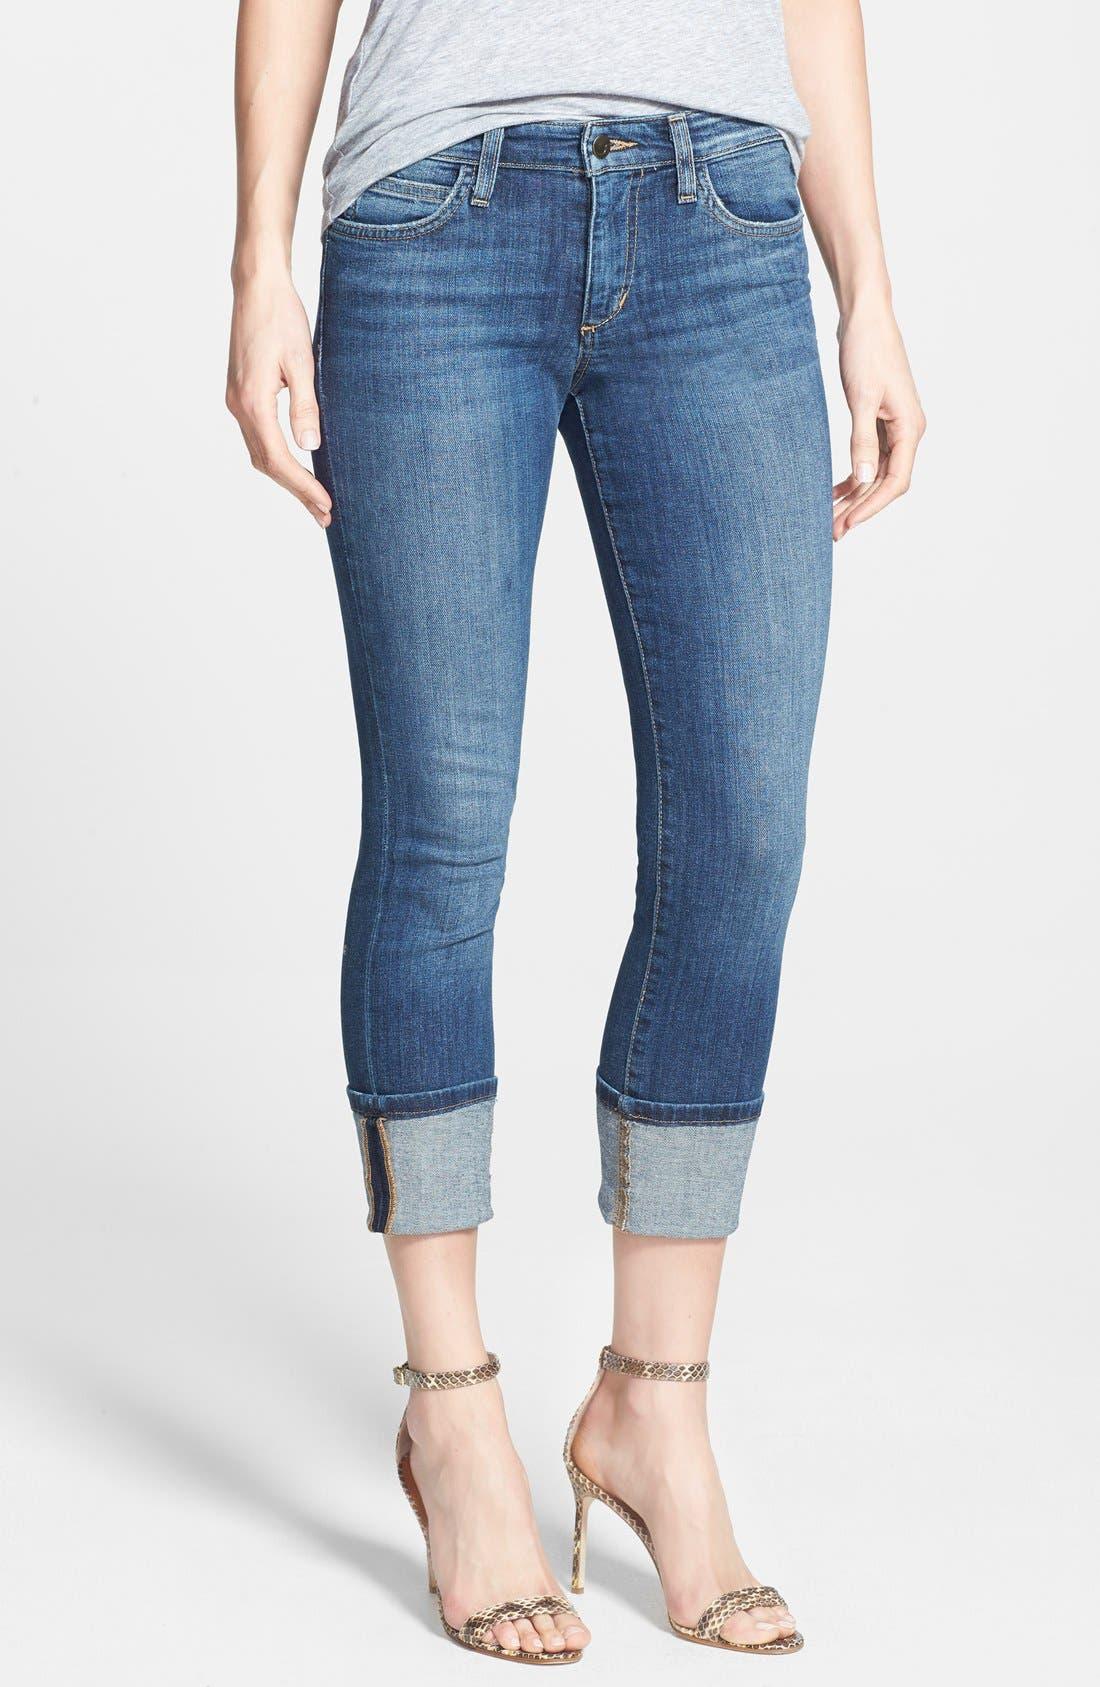 Alternate Image 1 Selected - Joe's Crop Skinny Jeans (Judi)